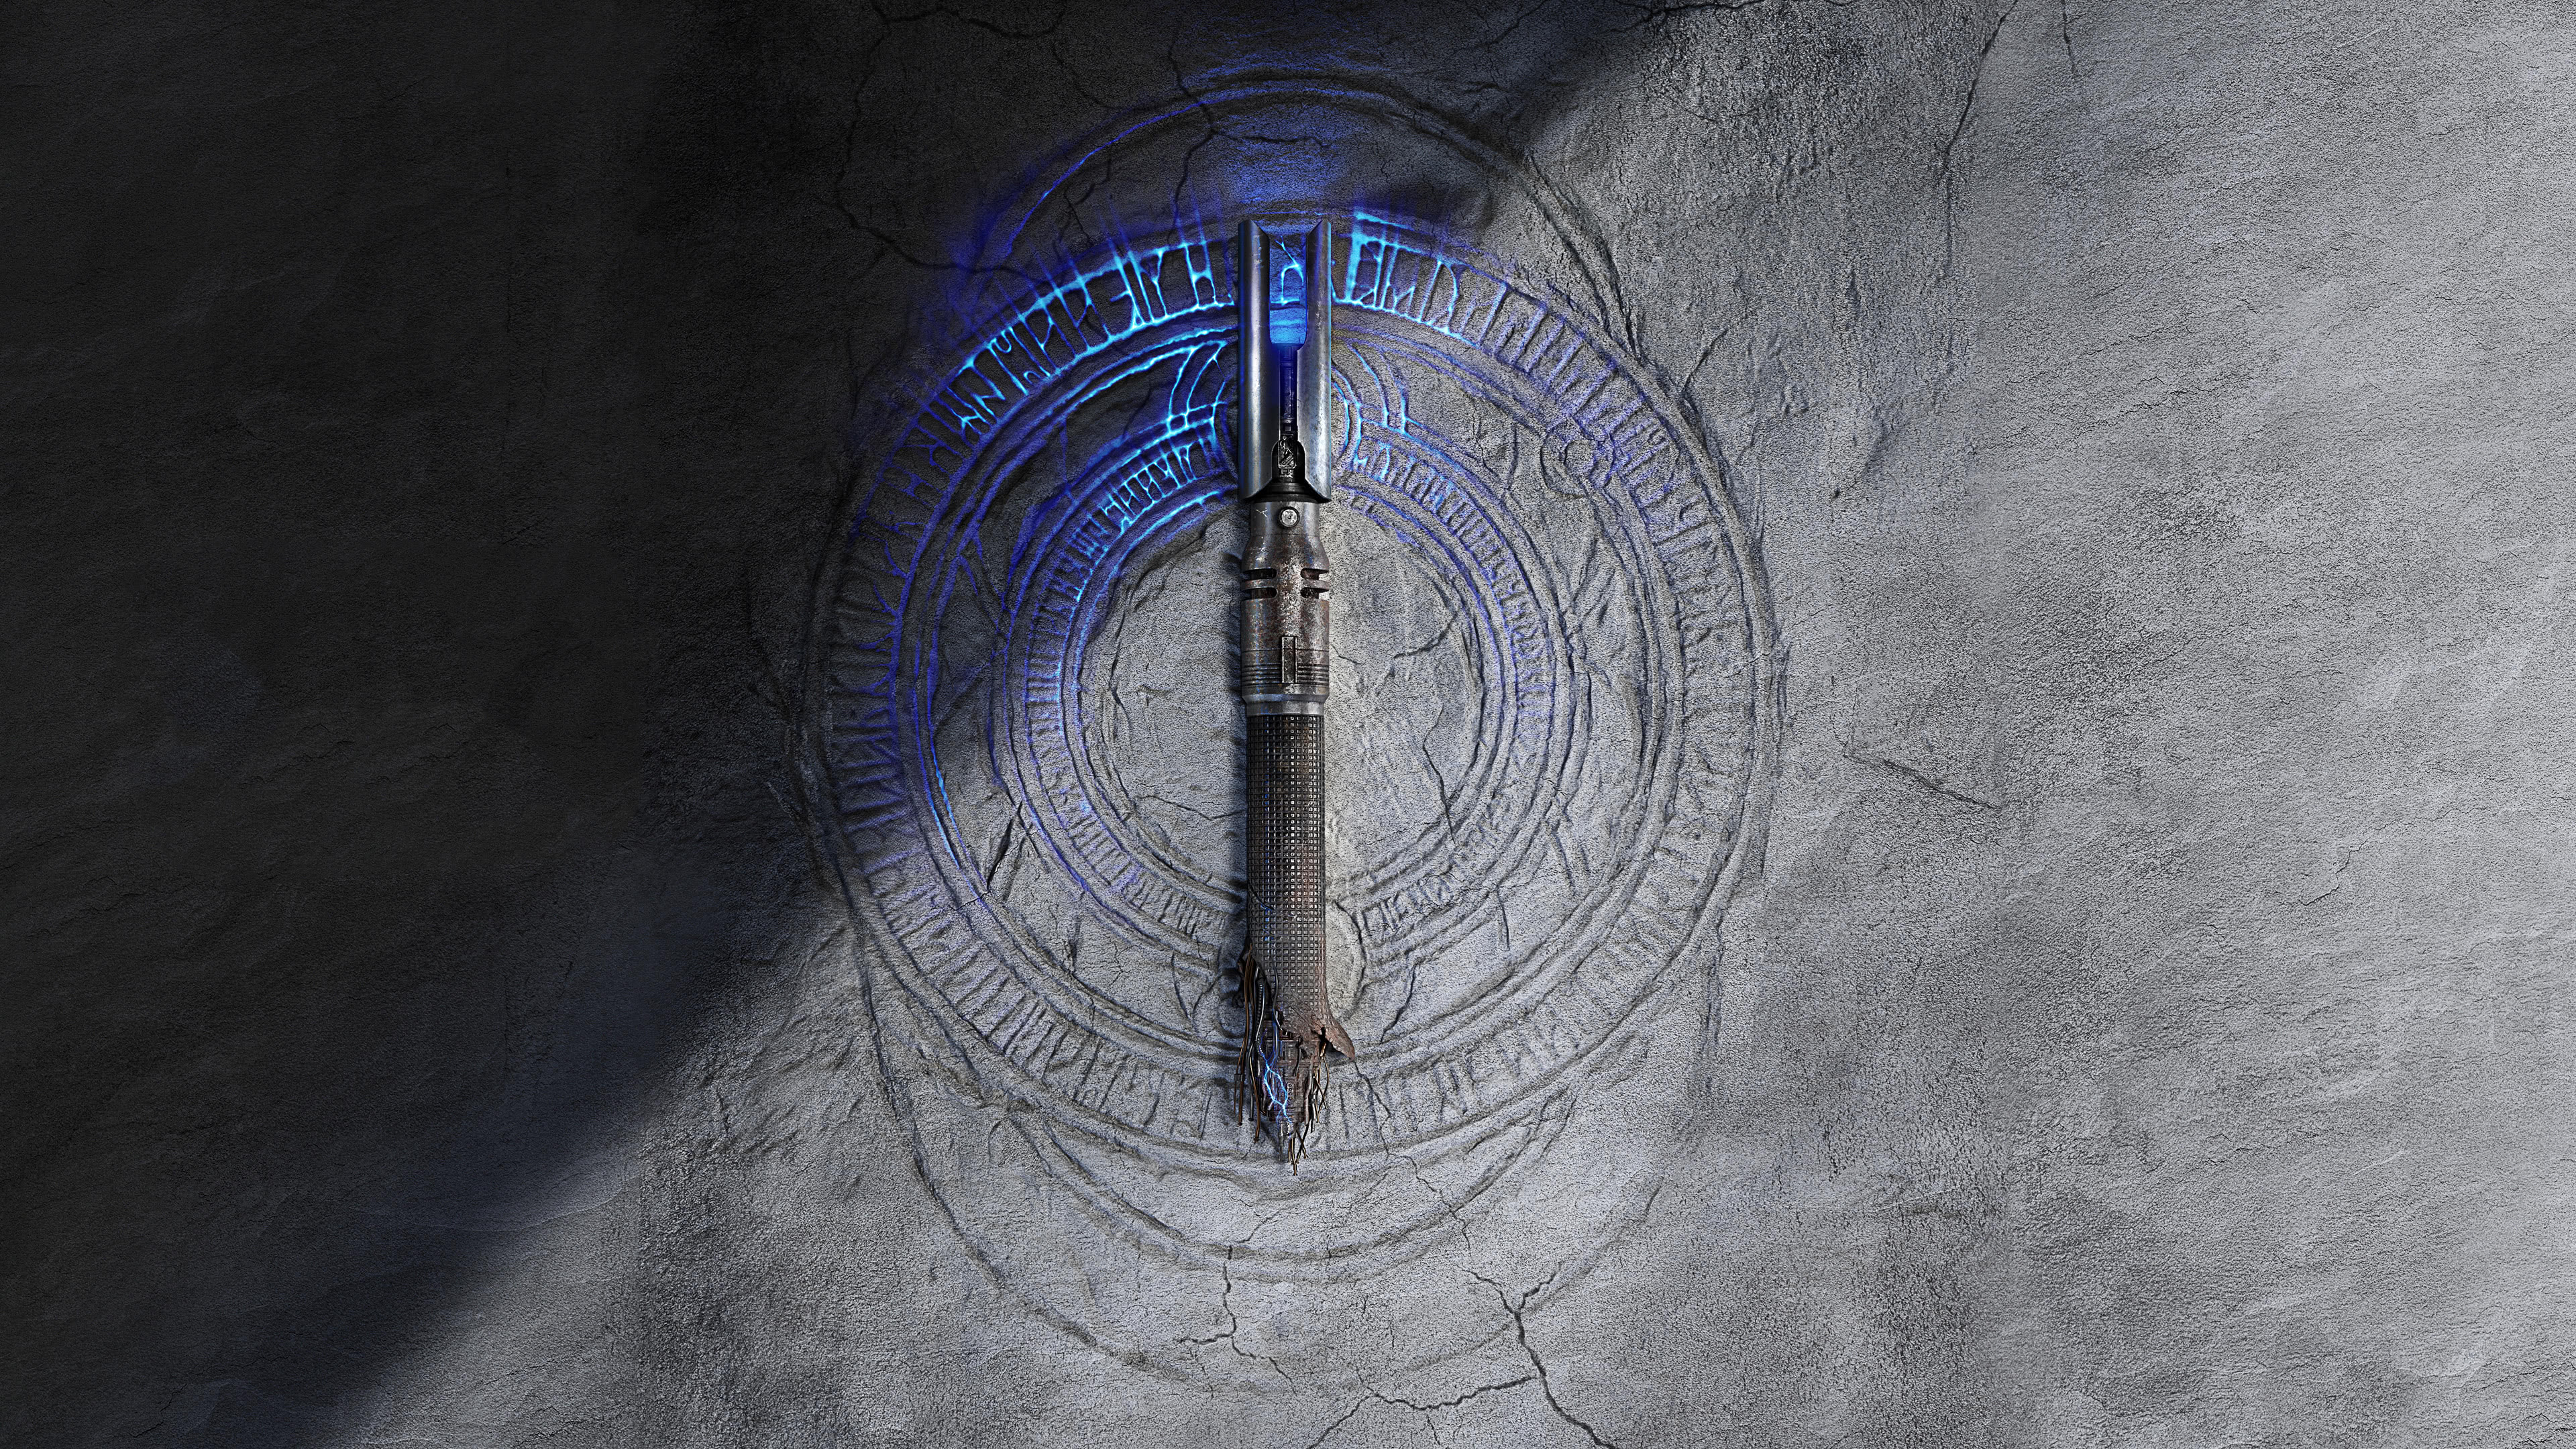 star wars jedi fallen order lightsaber uhd 4k wallpaper